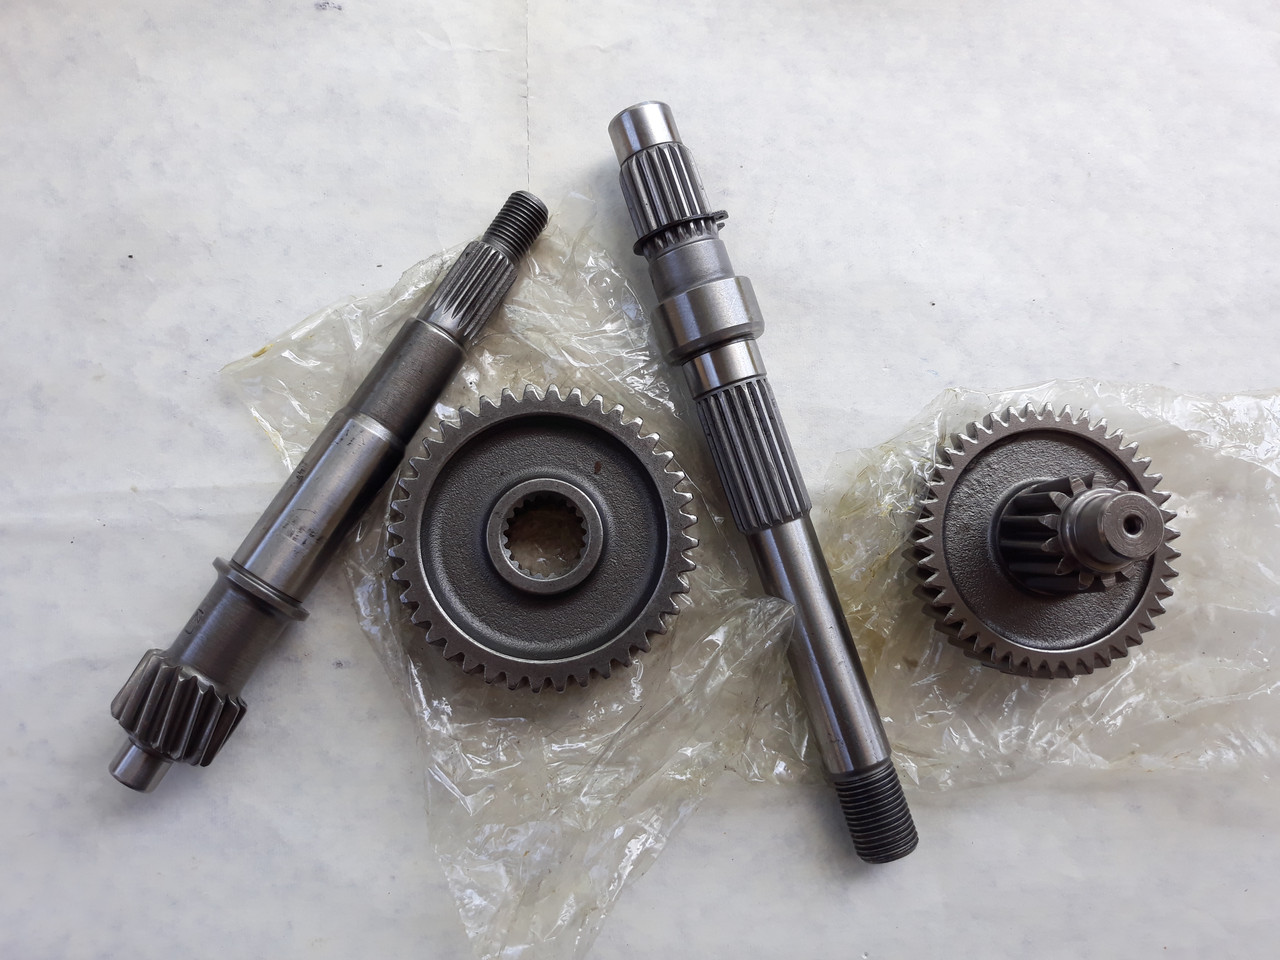 Редуктор под 2 амортизатор для GY6 125, 150cc